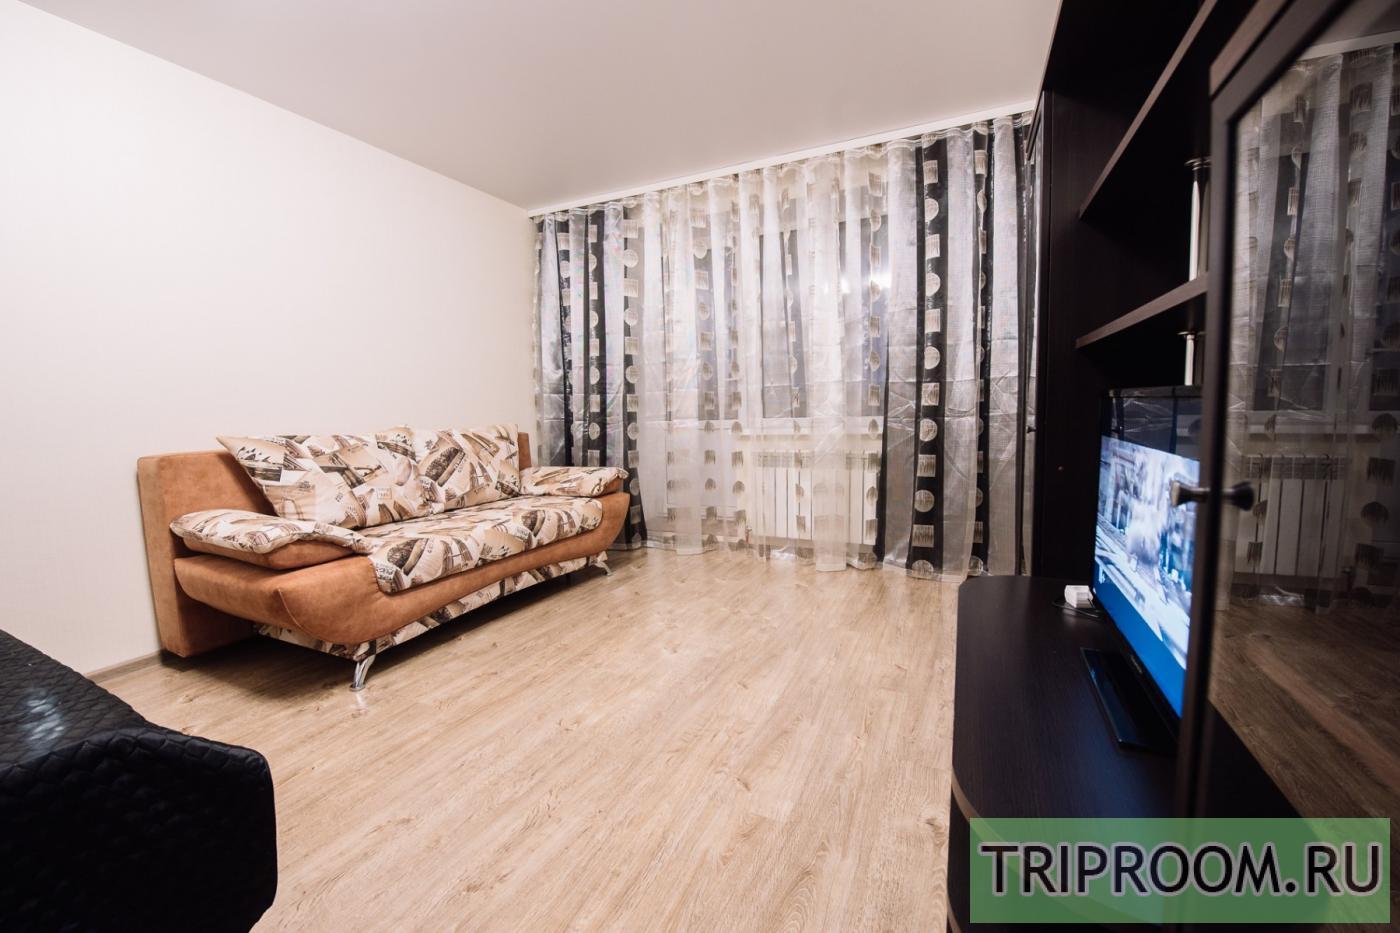 1-комнатная квартира посуточно (вариант № 21616), ул. Нормандия-Неман, фото № 4